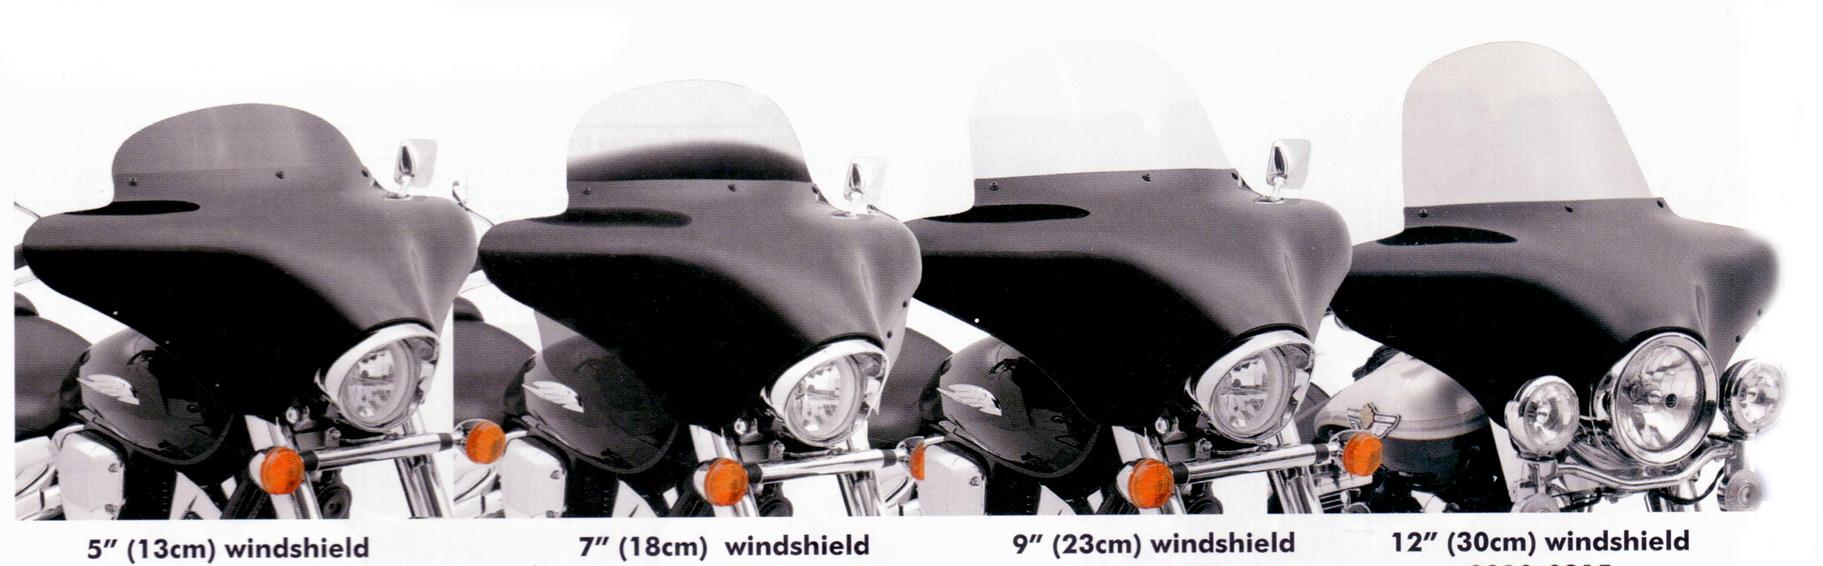 Windshield Batwing